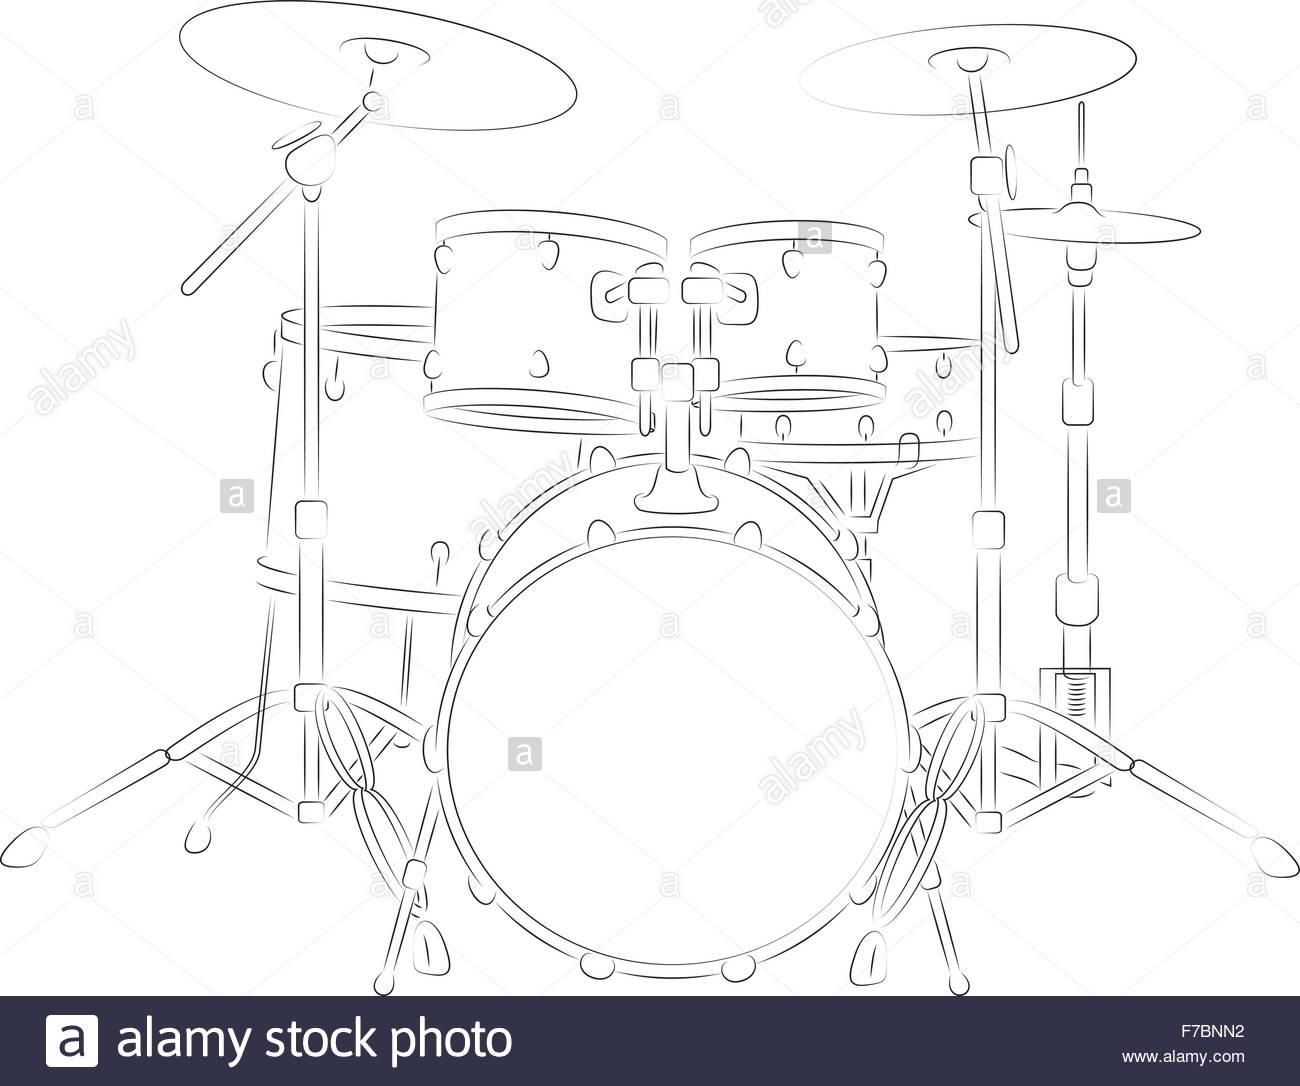 Drum Set Outline - Stock Image